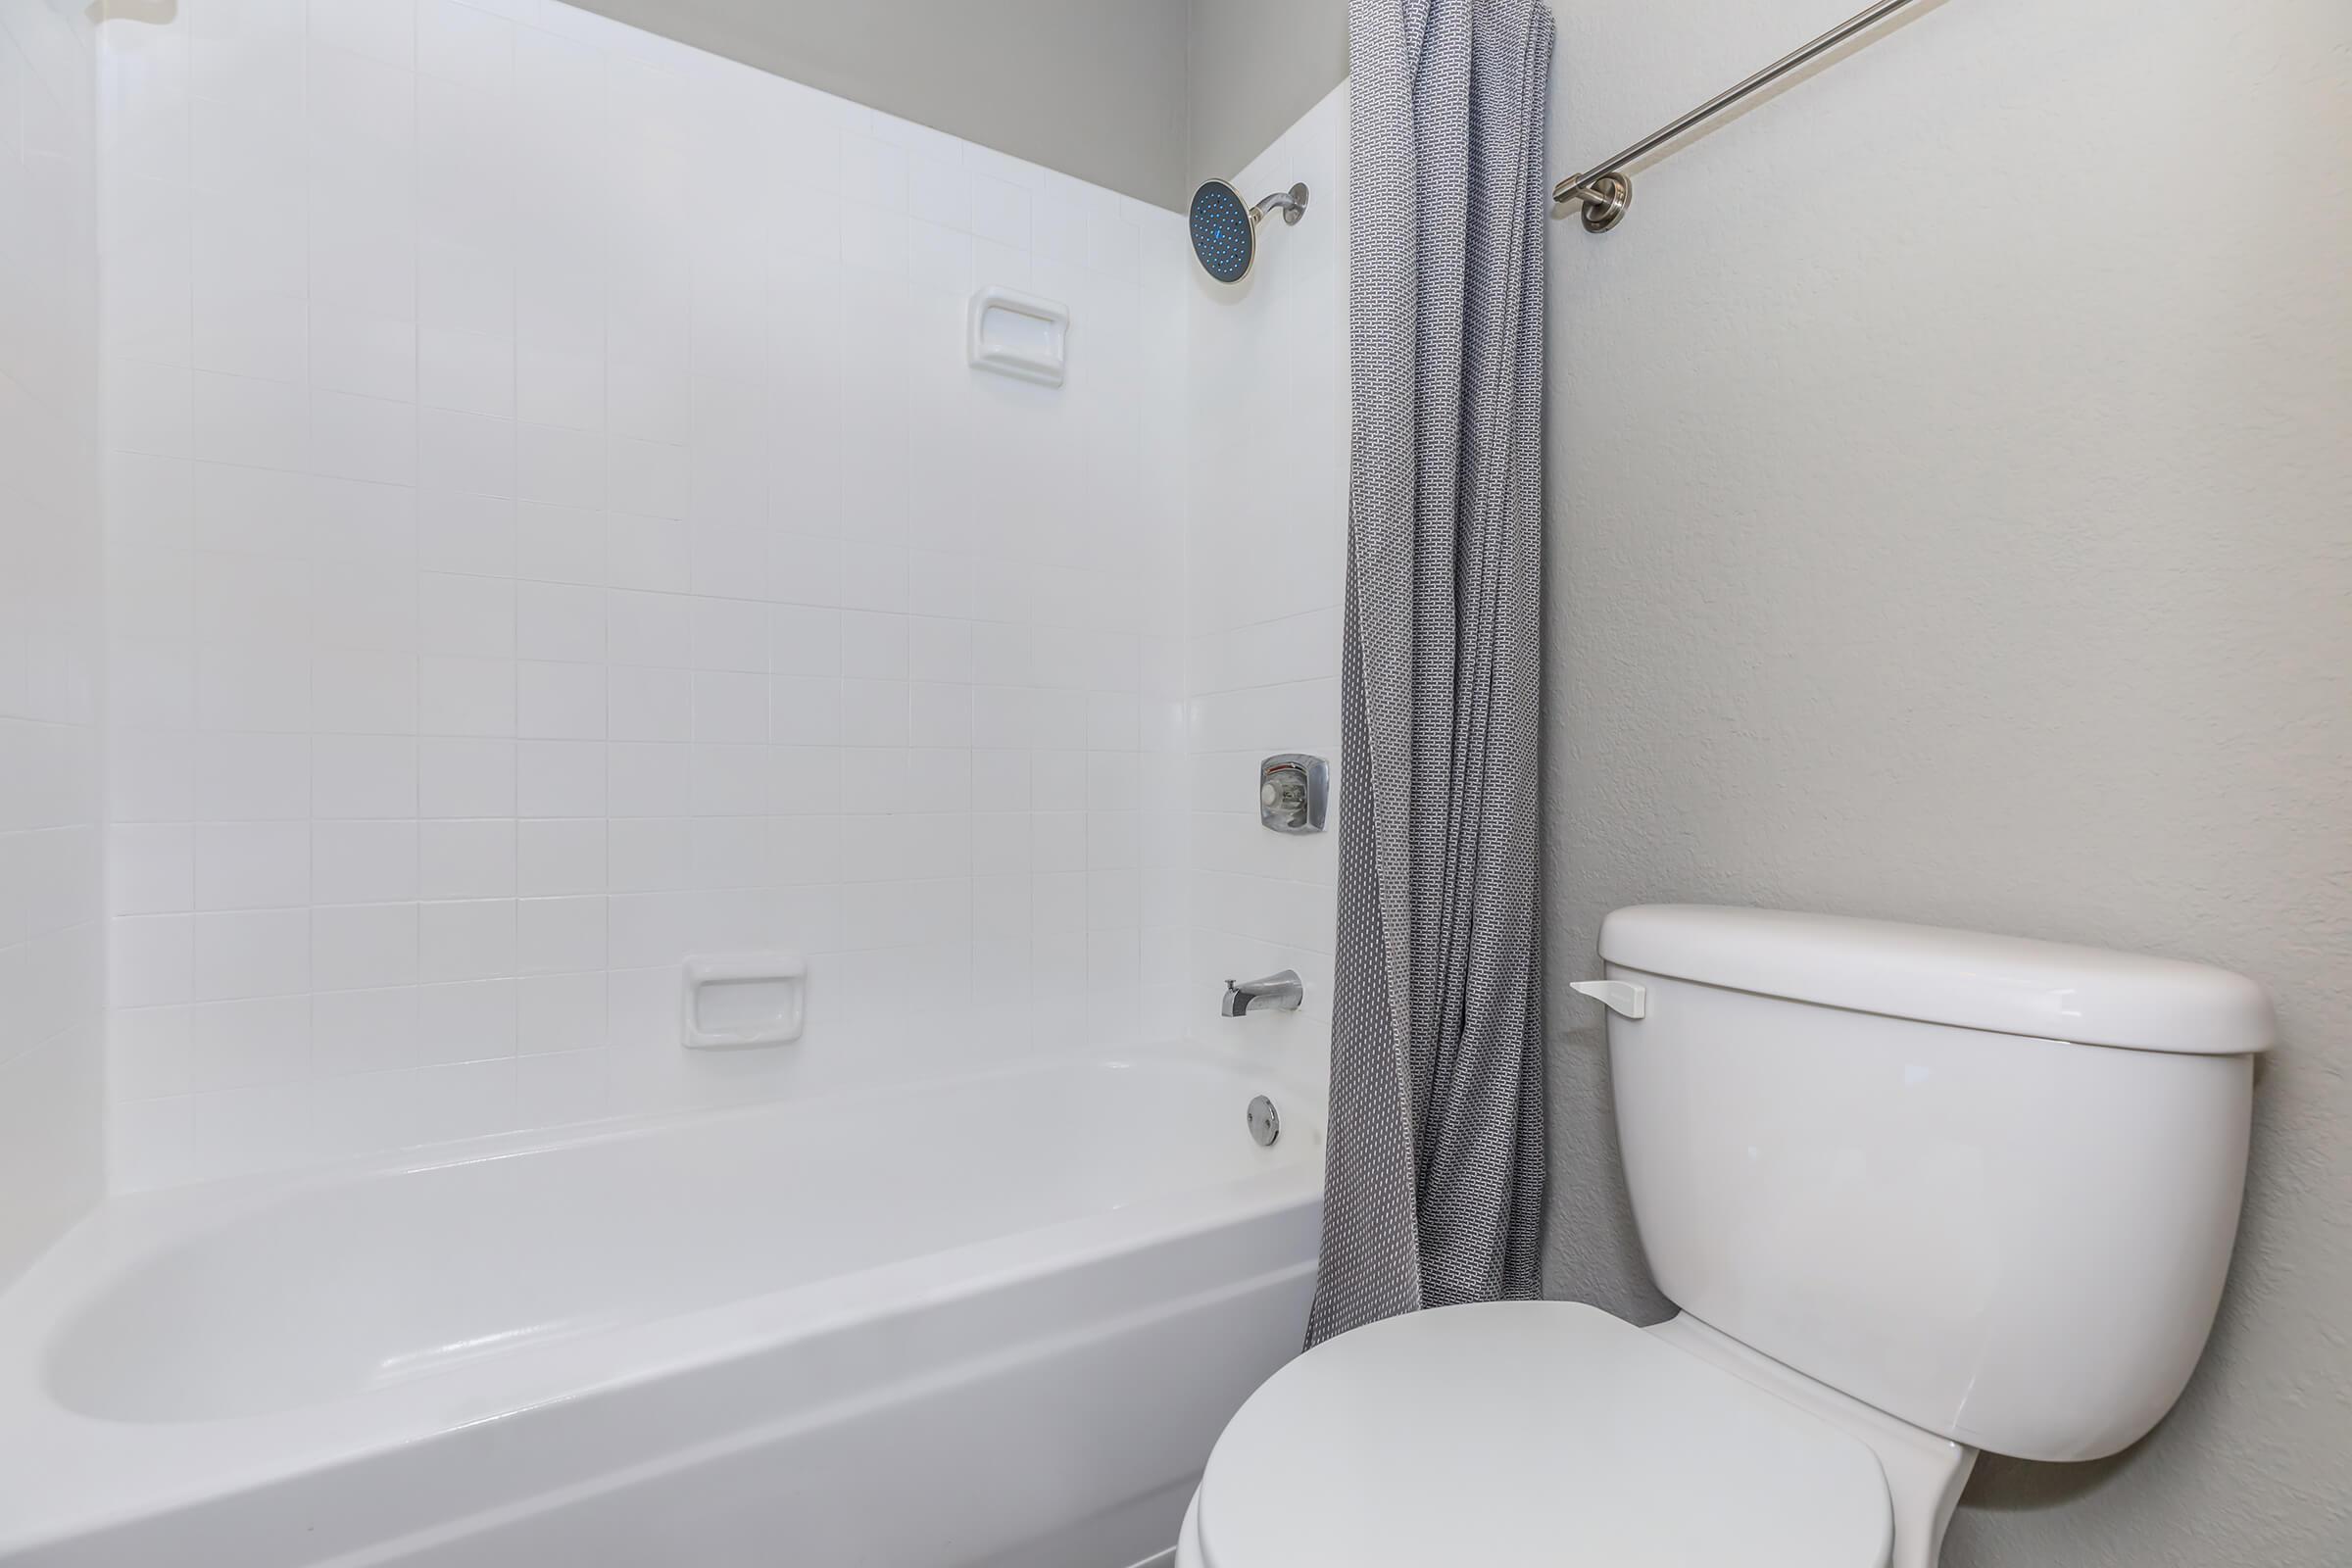 a shower stall